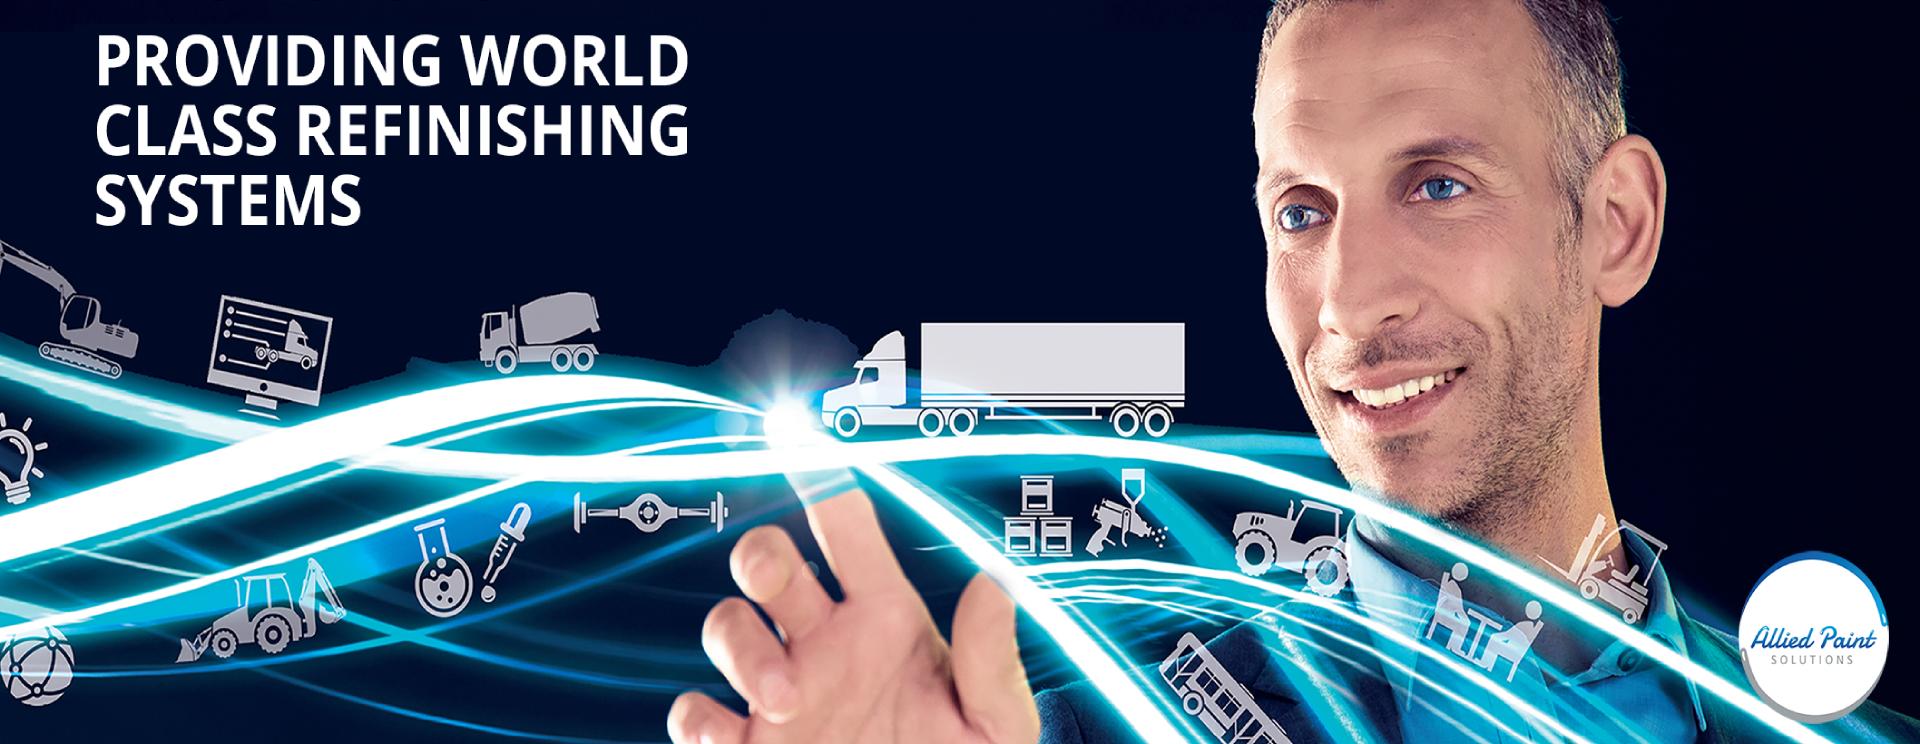 Providing-world-class-refinishing-systems-V3